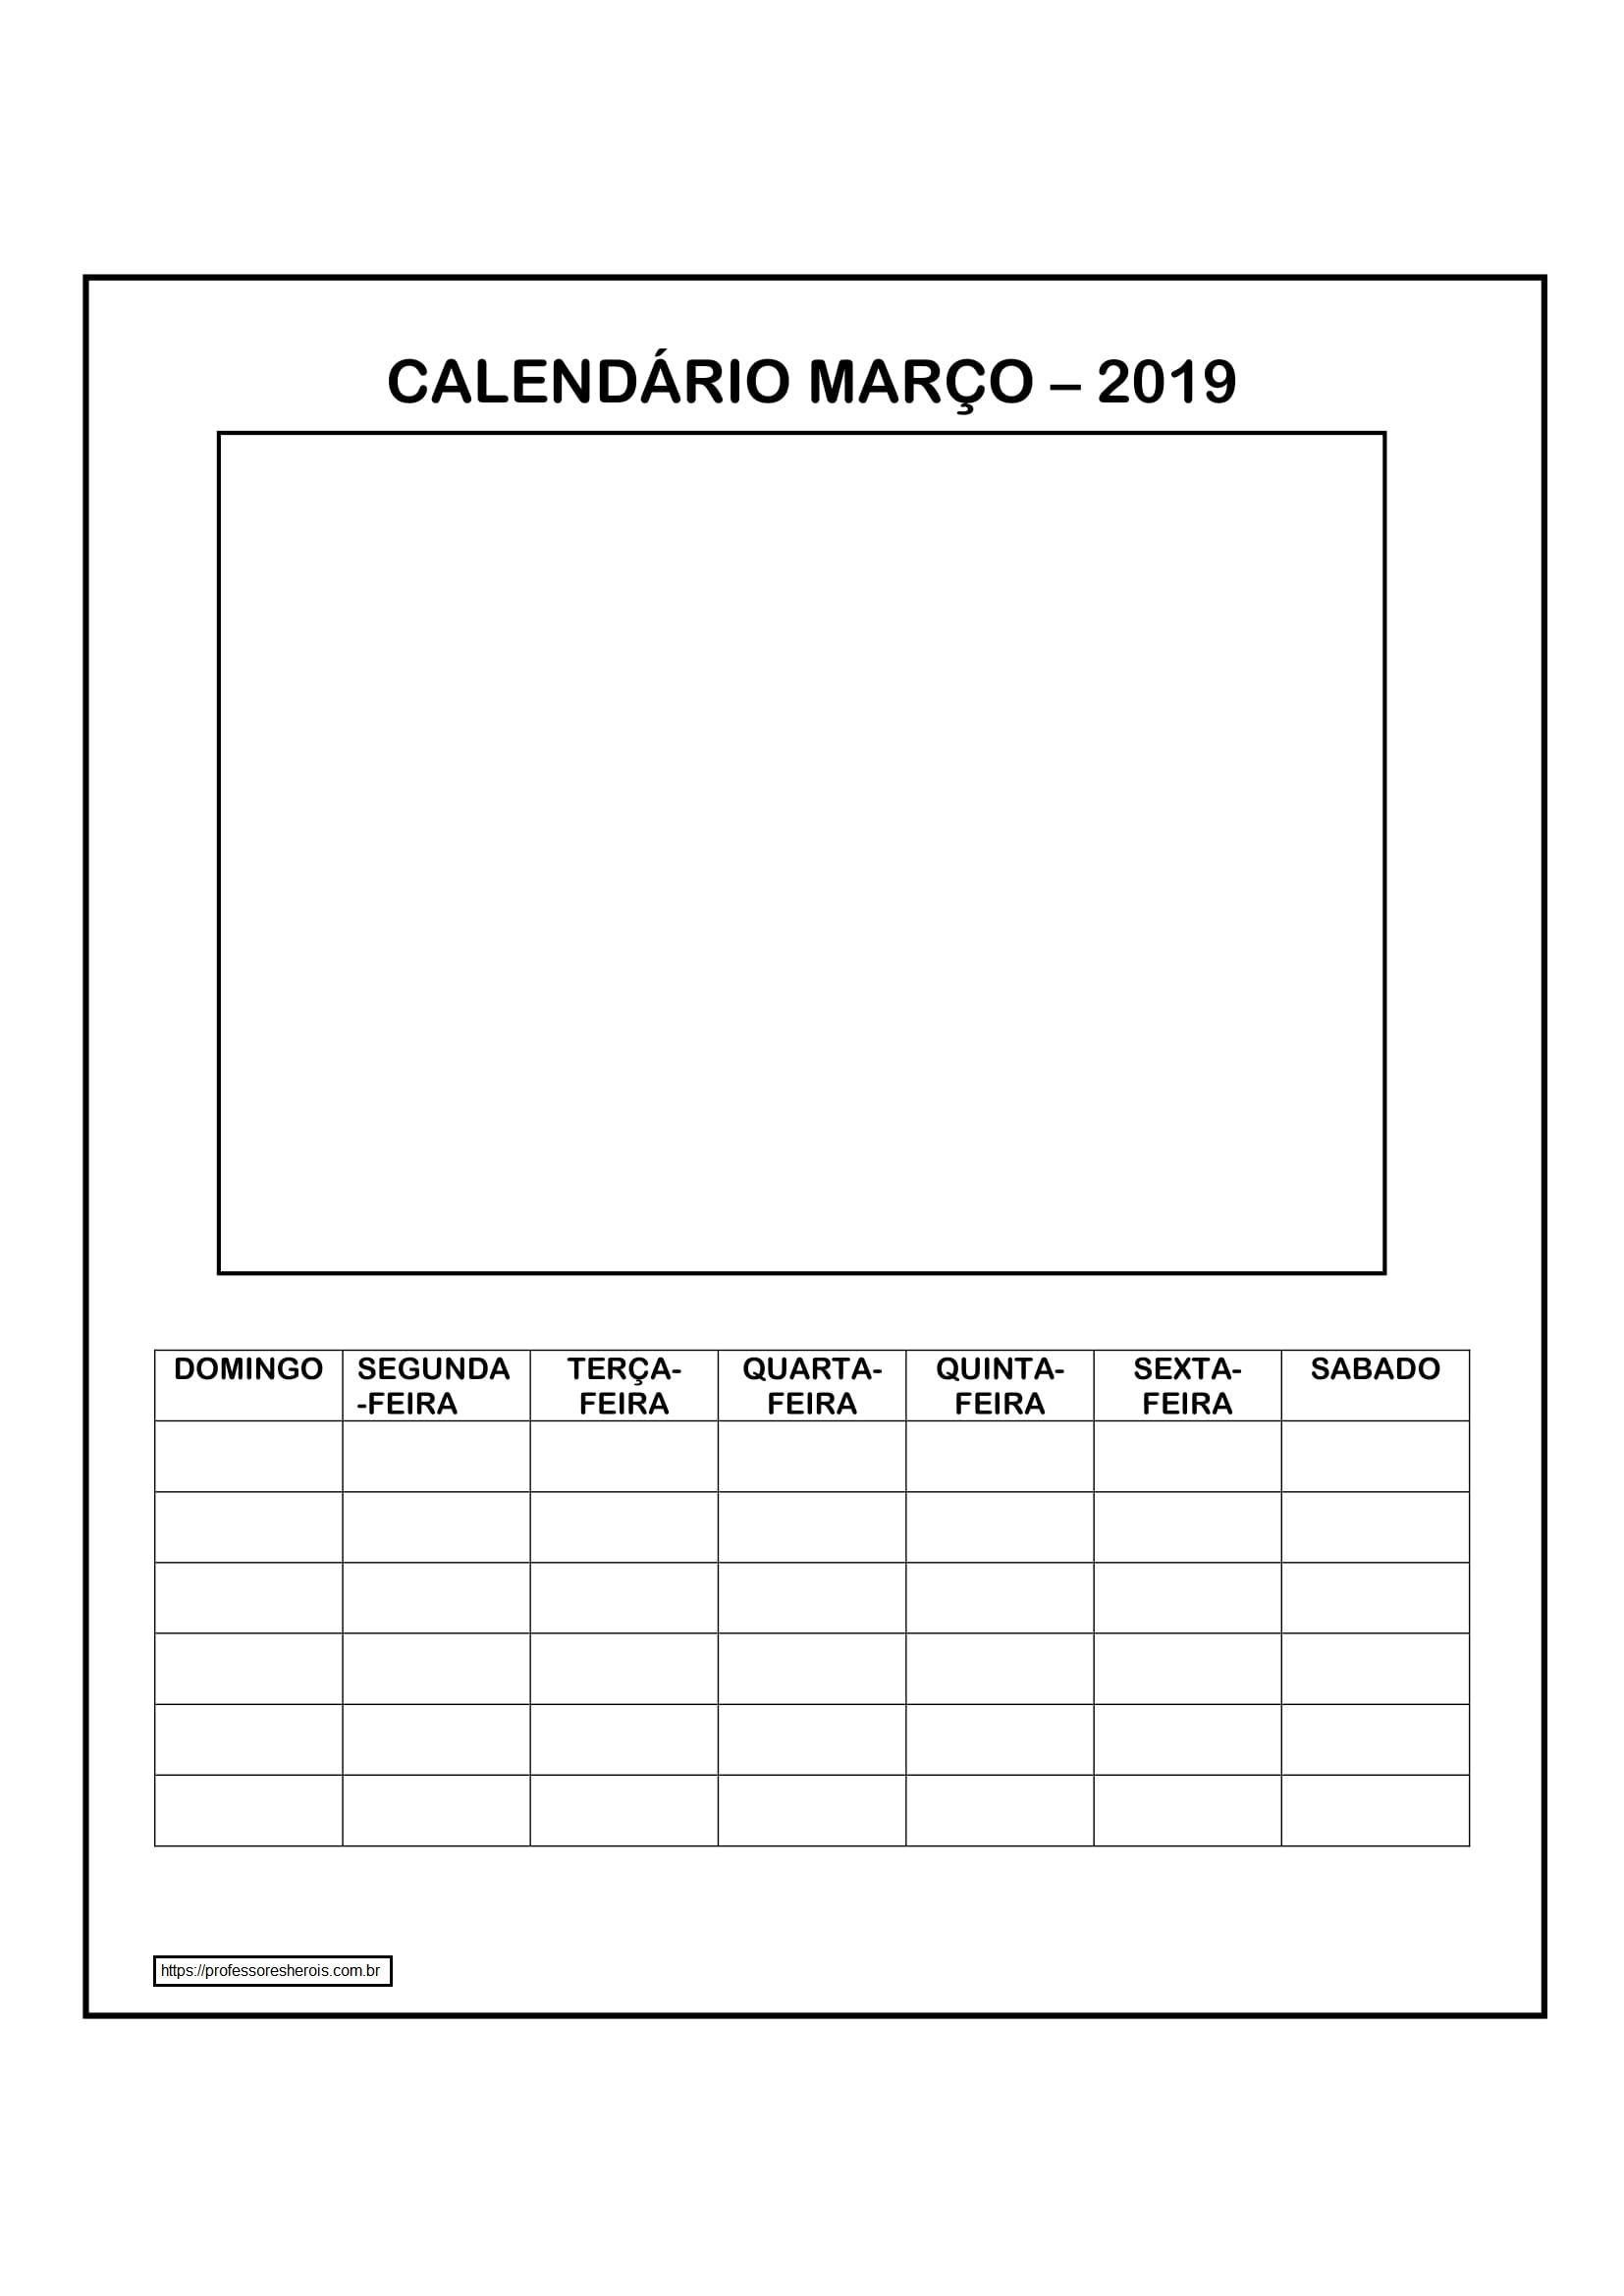 cadendario-para-completar-e-colorir-2019-março-c-1